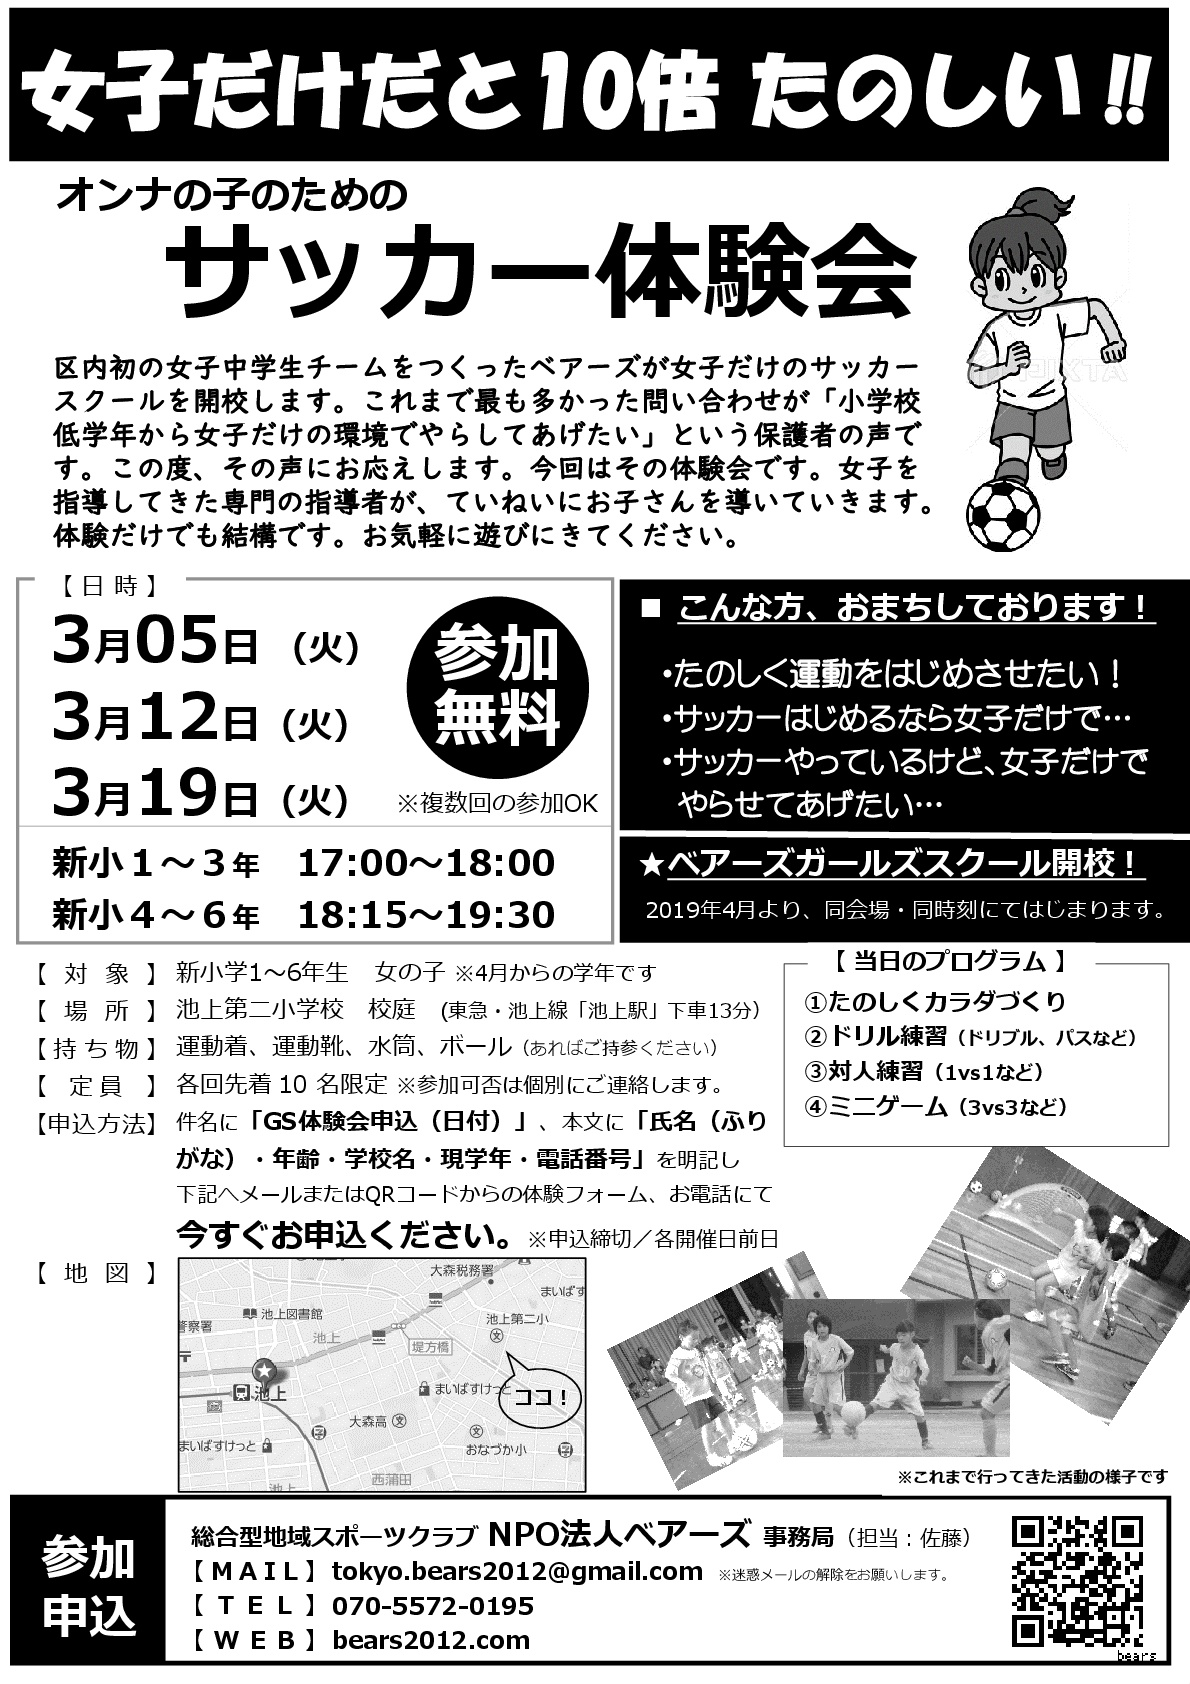 GS体験会チラシ_190216_final-001